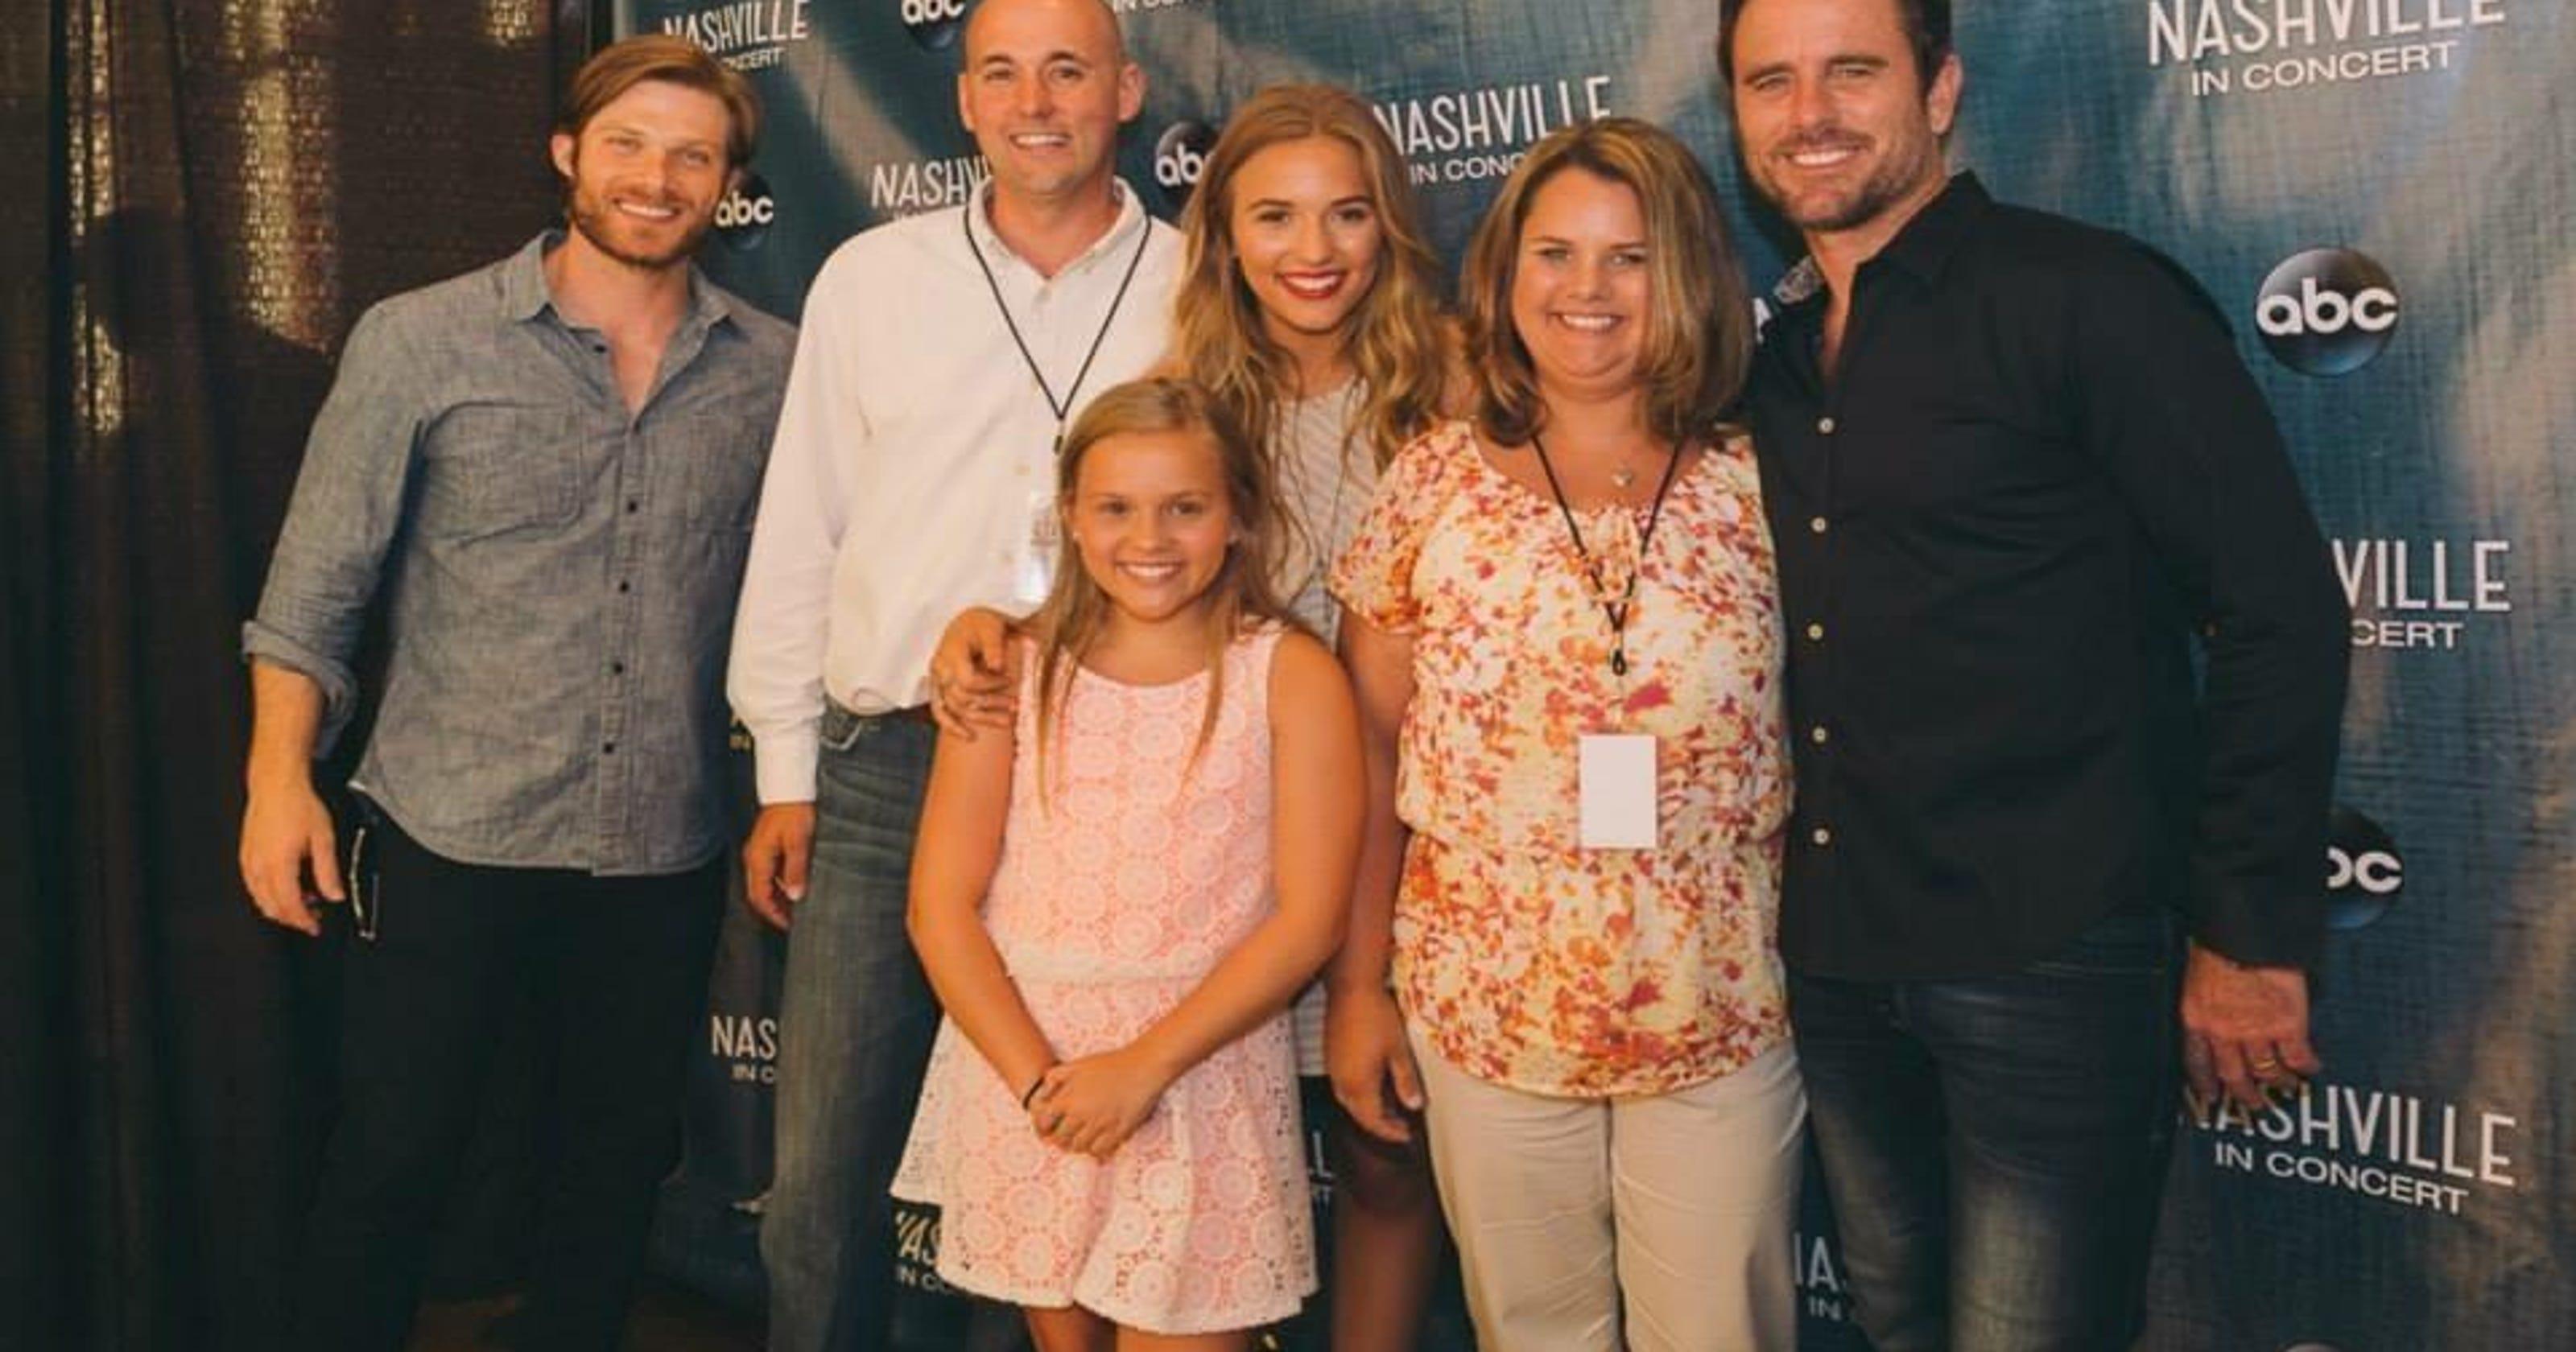 Local Couple Won Date Night Trip To Nashville